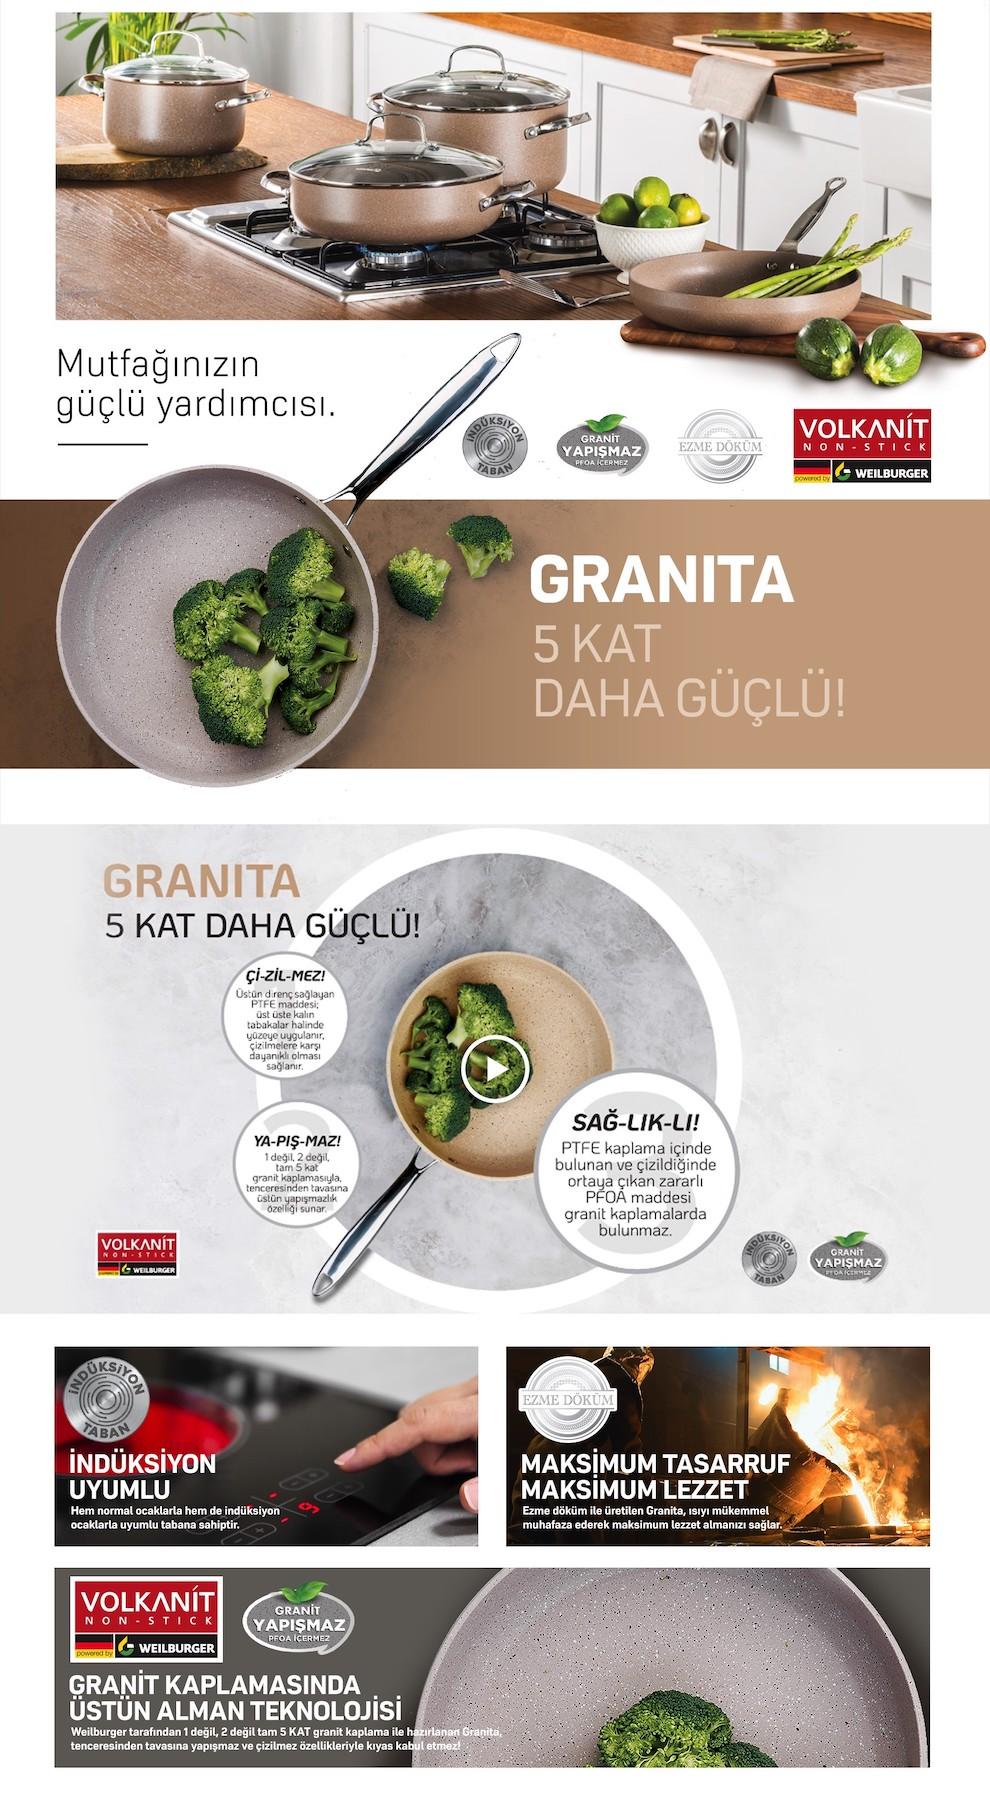 Granita_detay